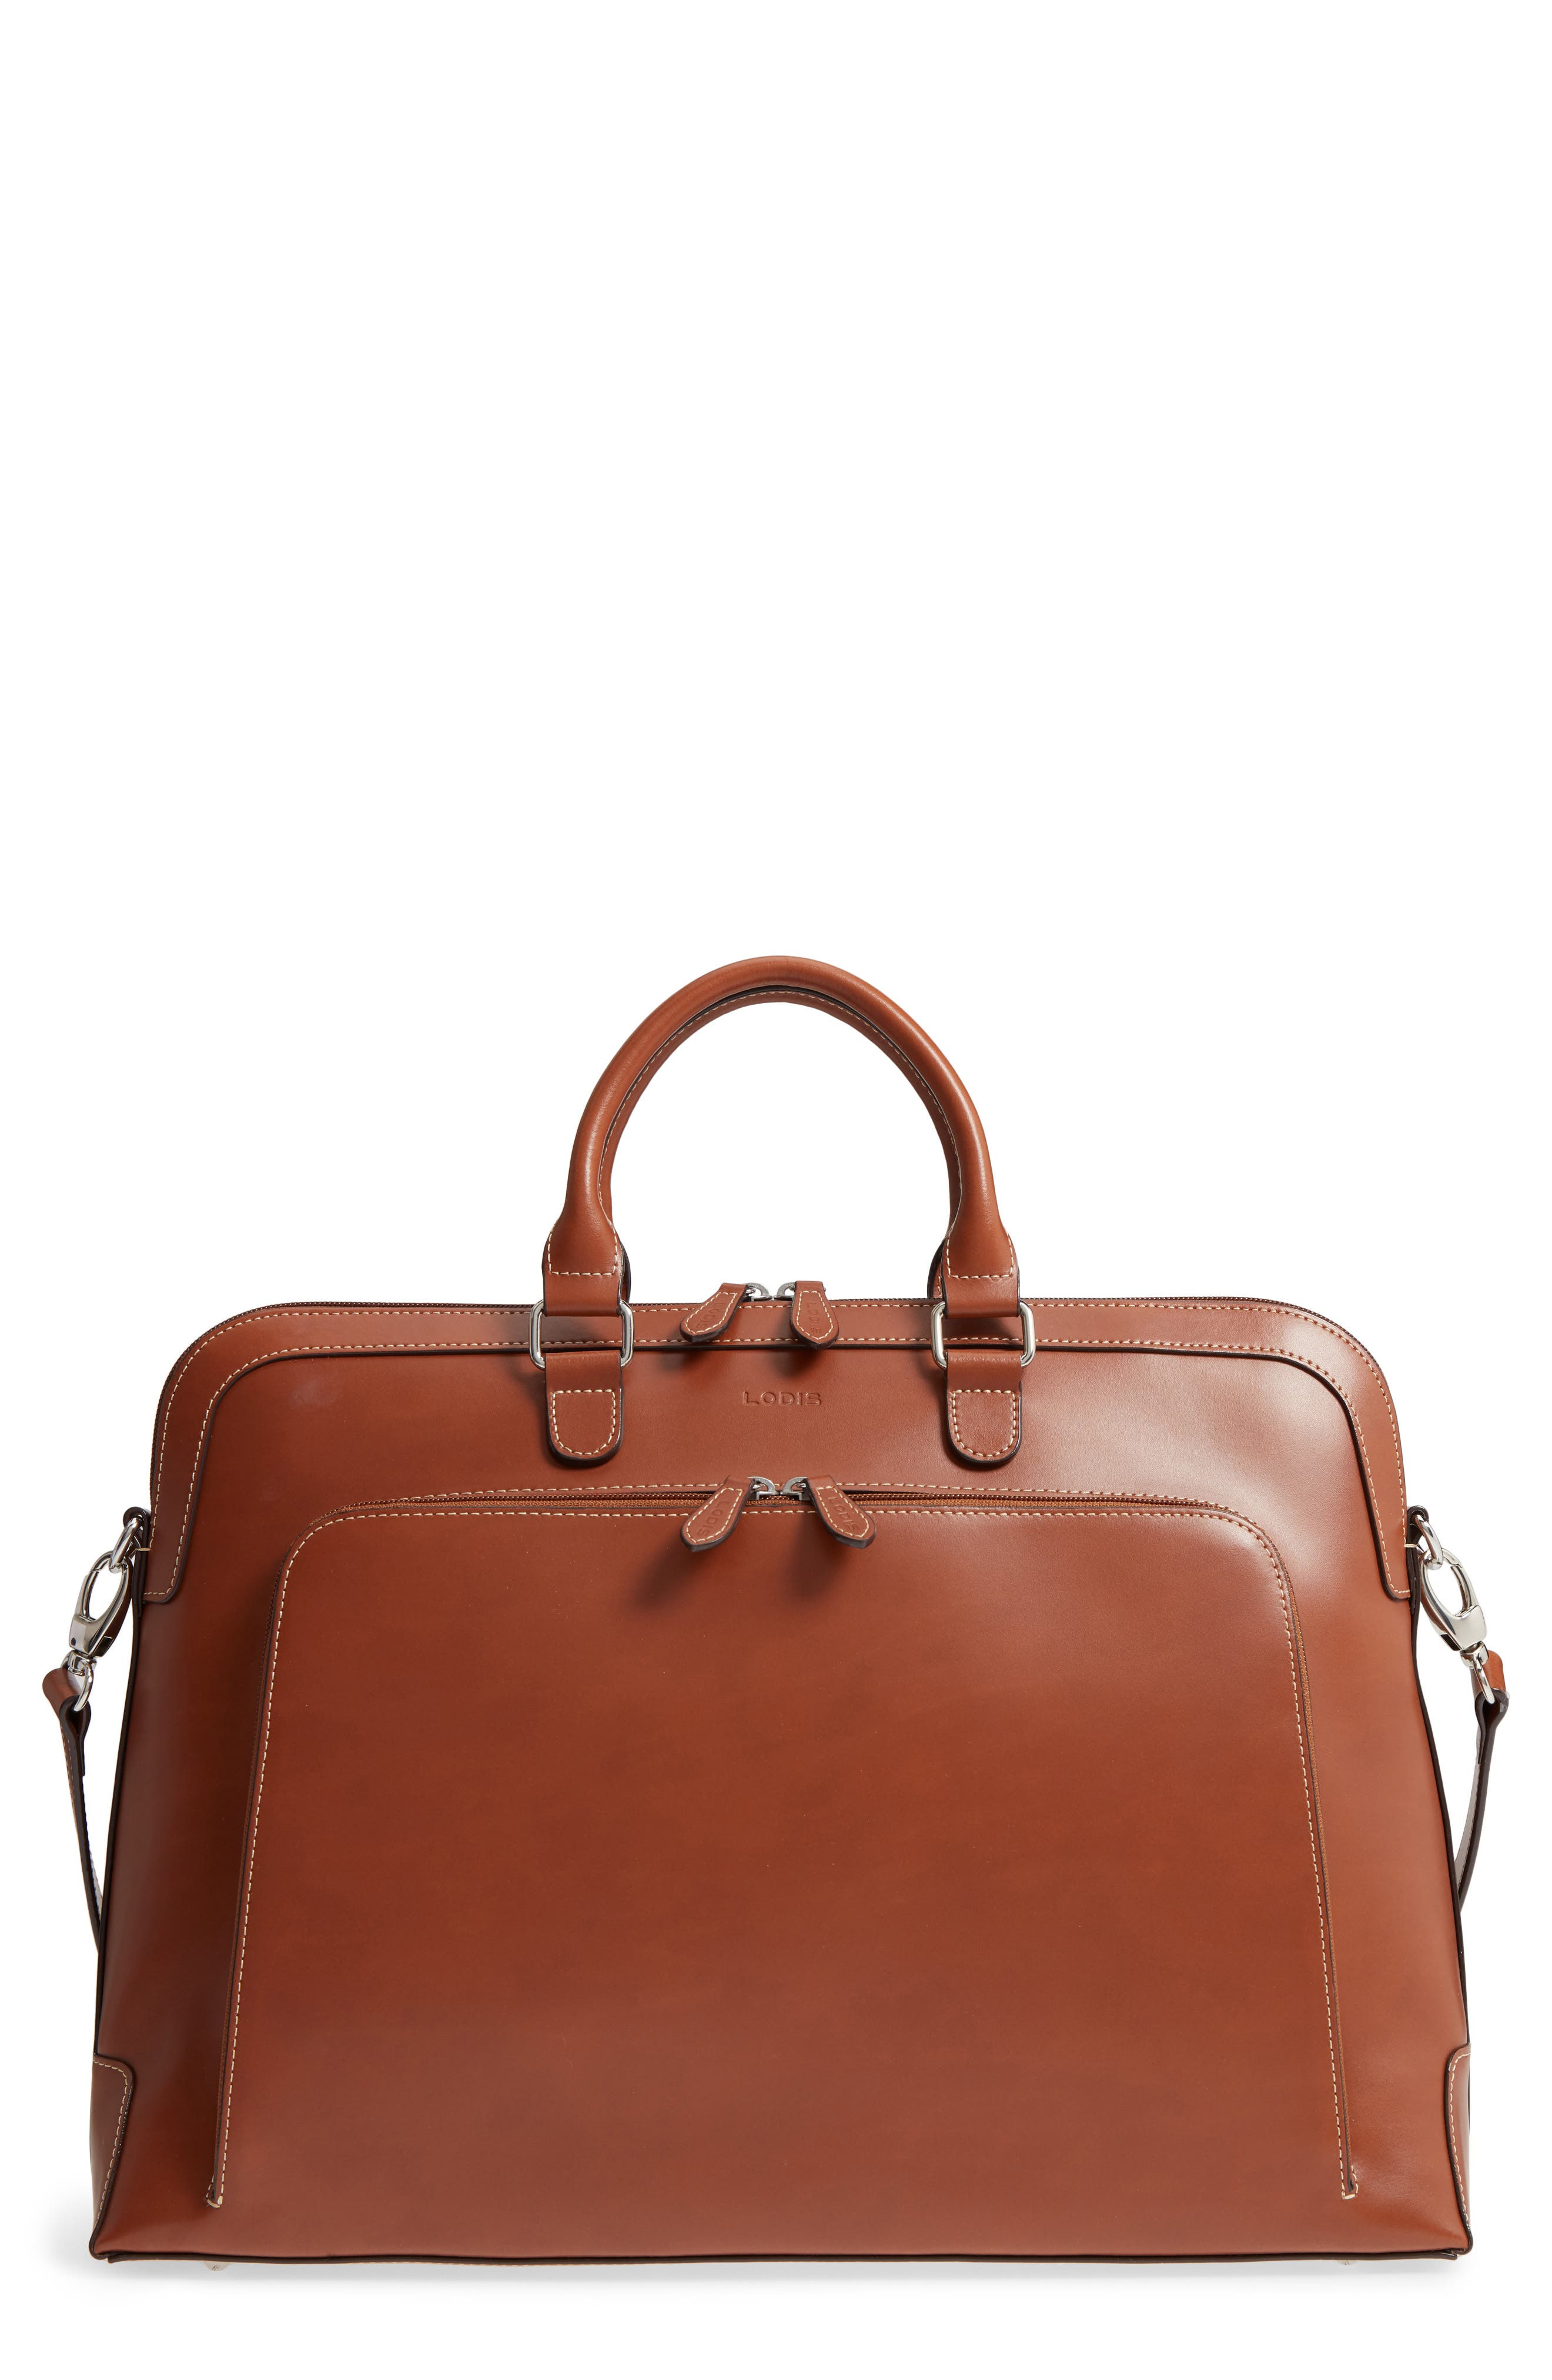 LODIS Los Angeles Audrey Under Lock & Key - Brera RFID Leather Briefcase